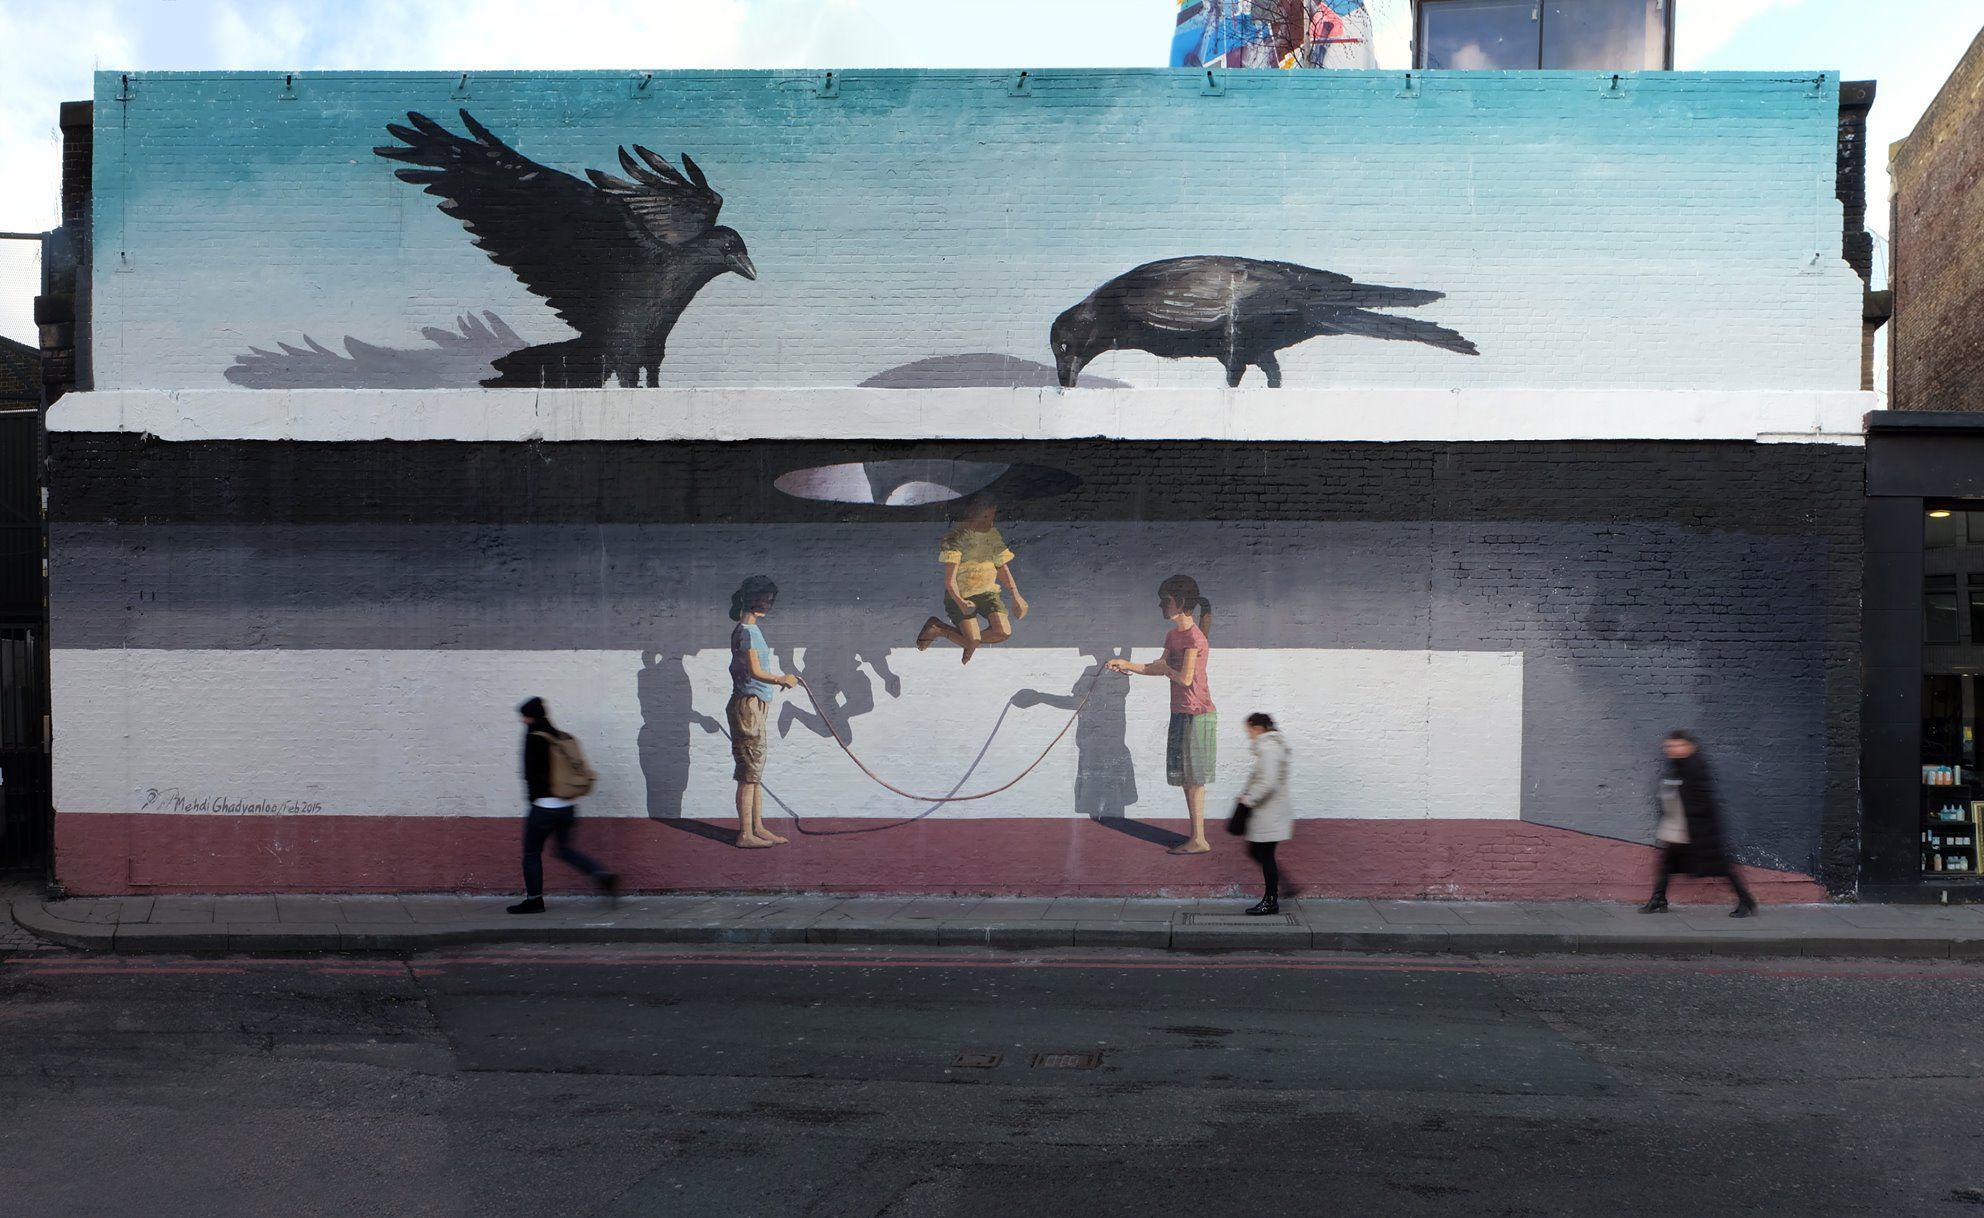 mehdi ghadyanloo street art optical illusion 0